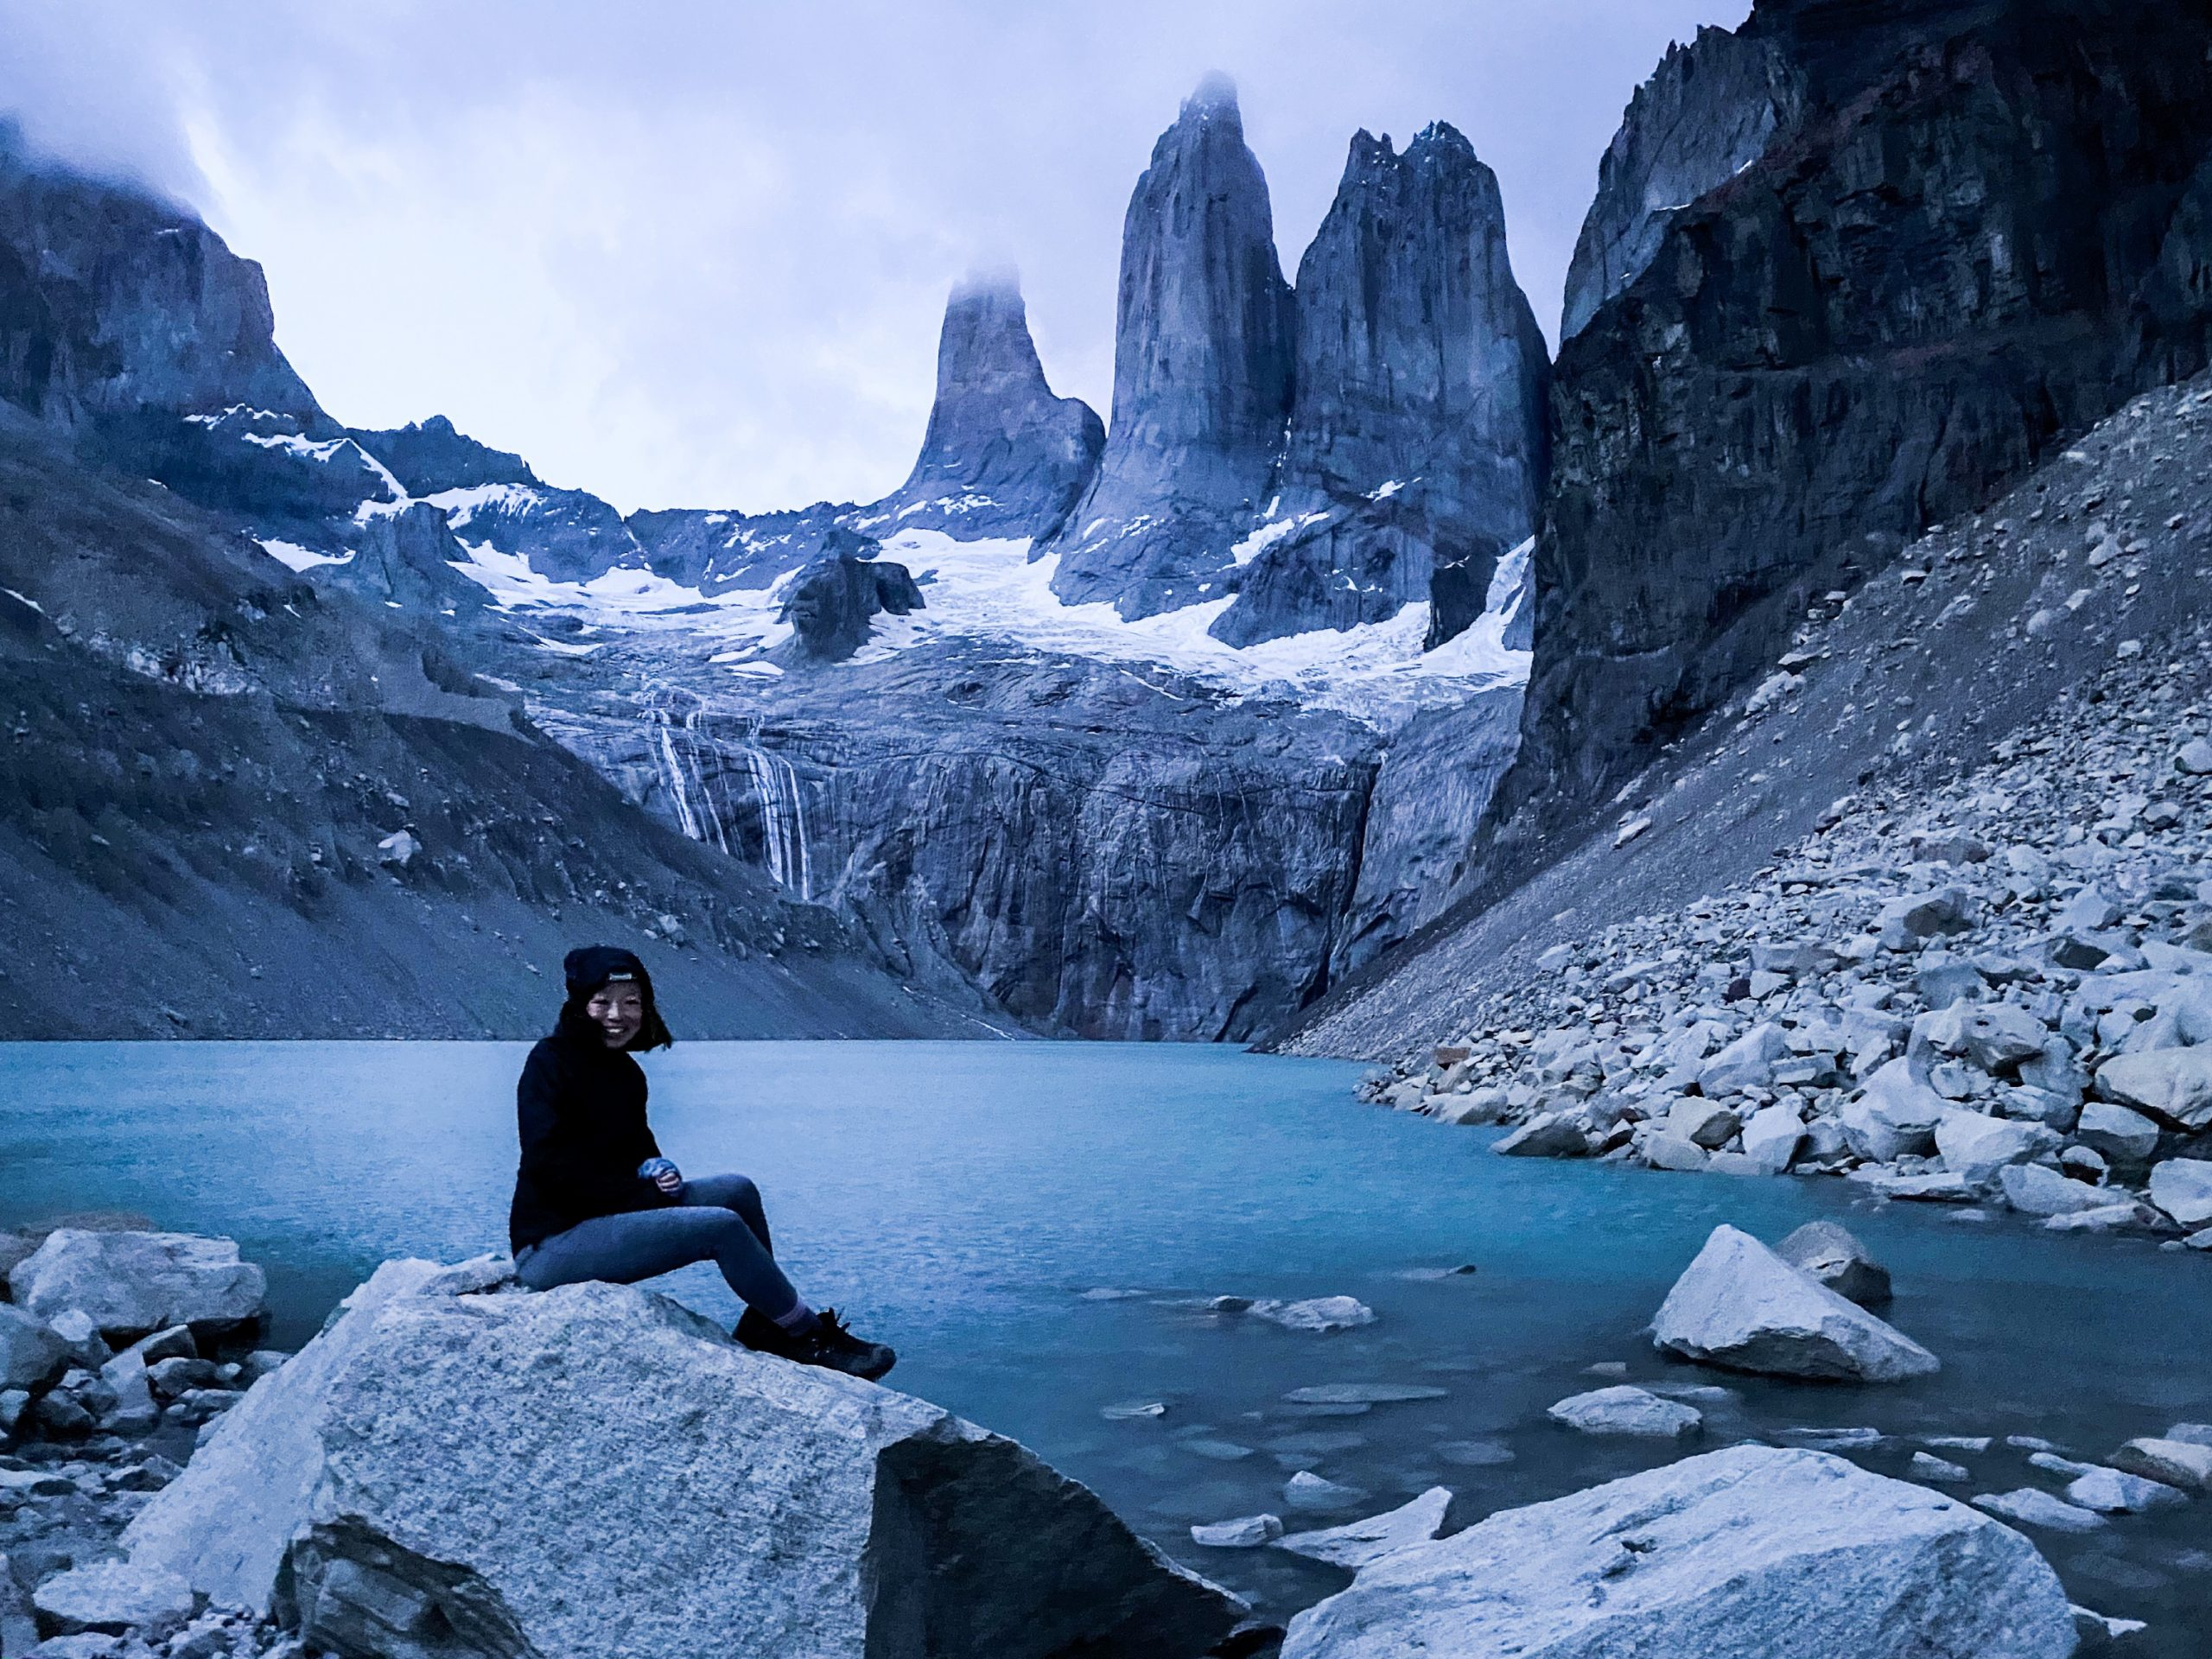 Las Torres - Torres del Paine W Trek